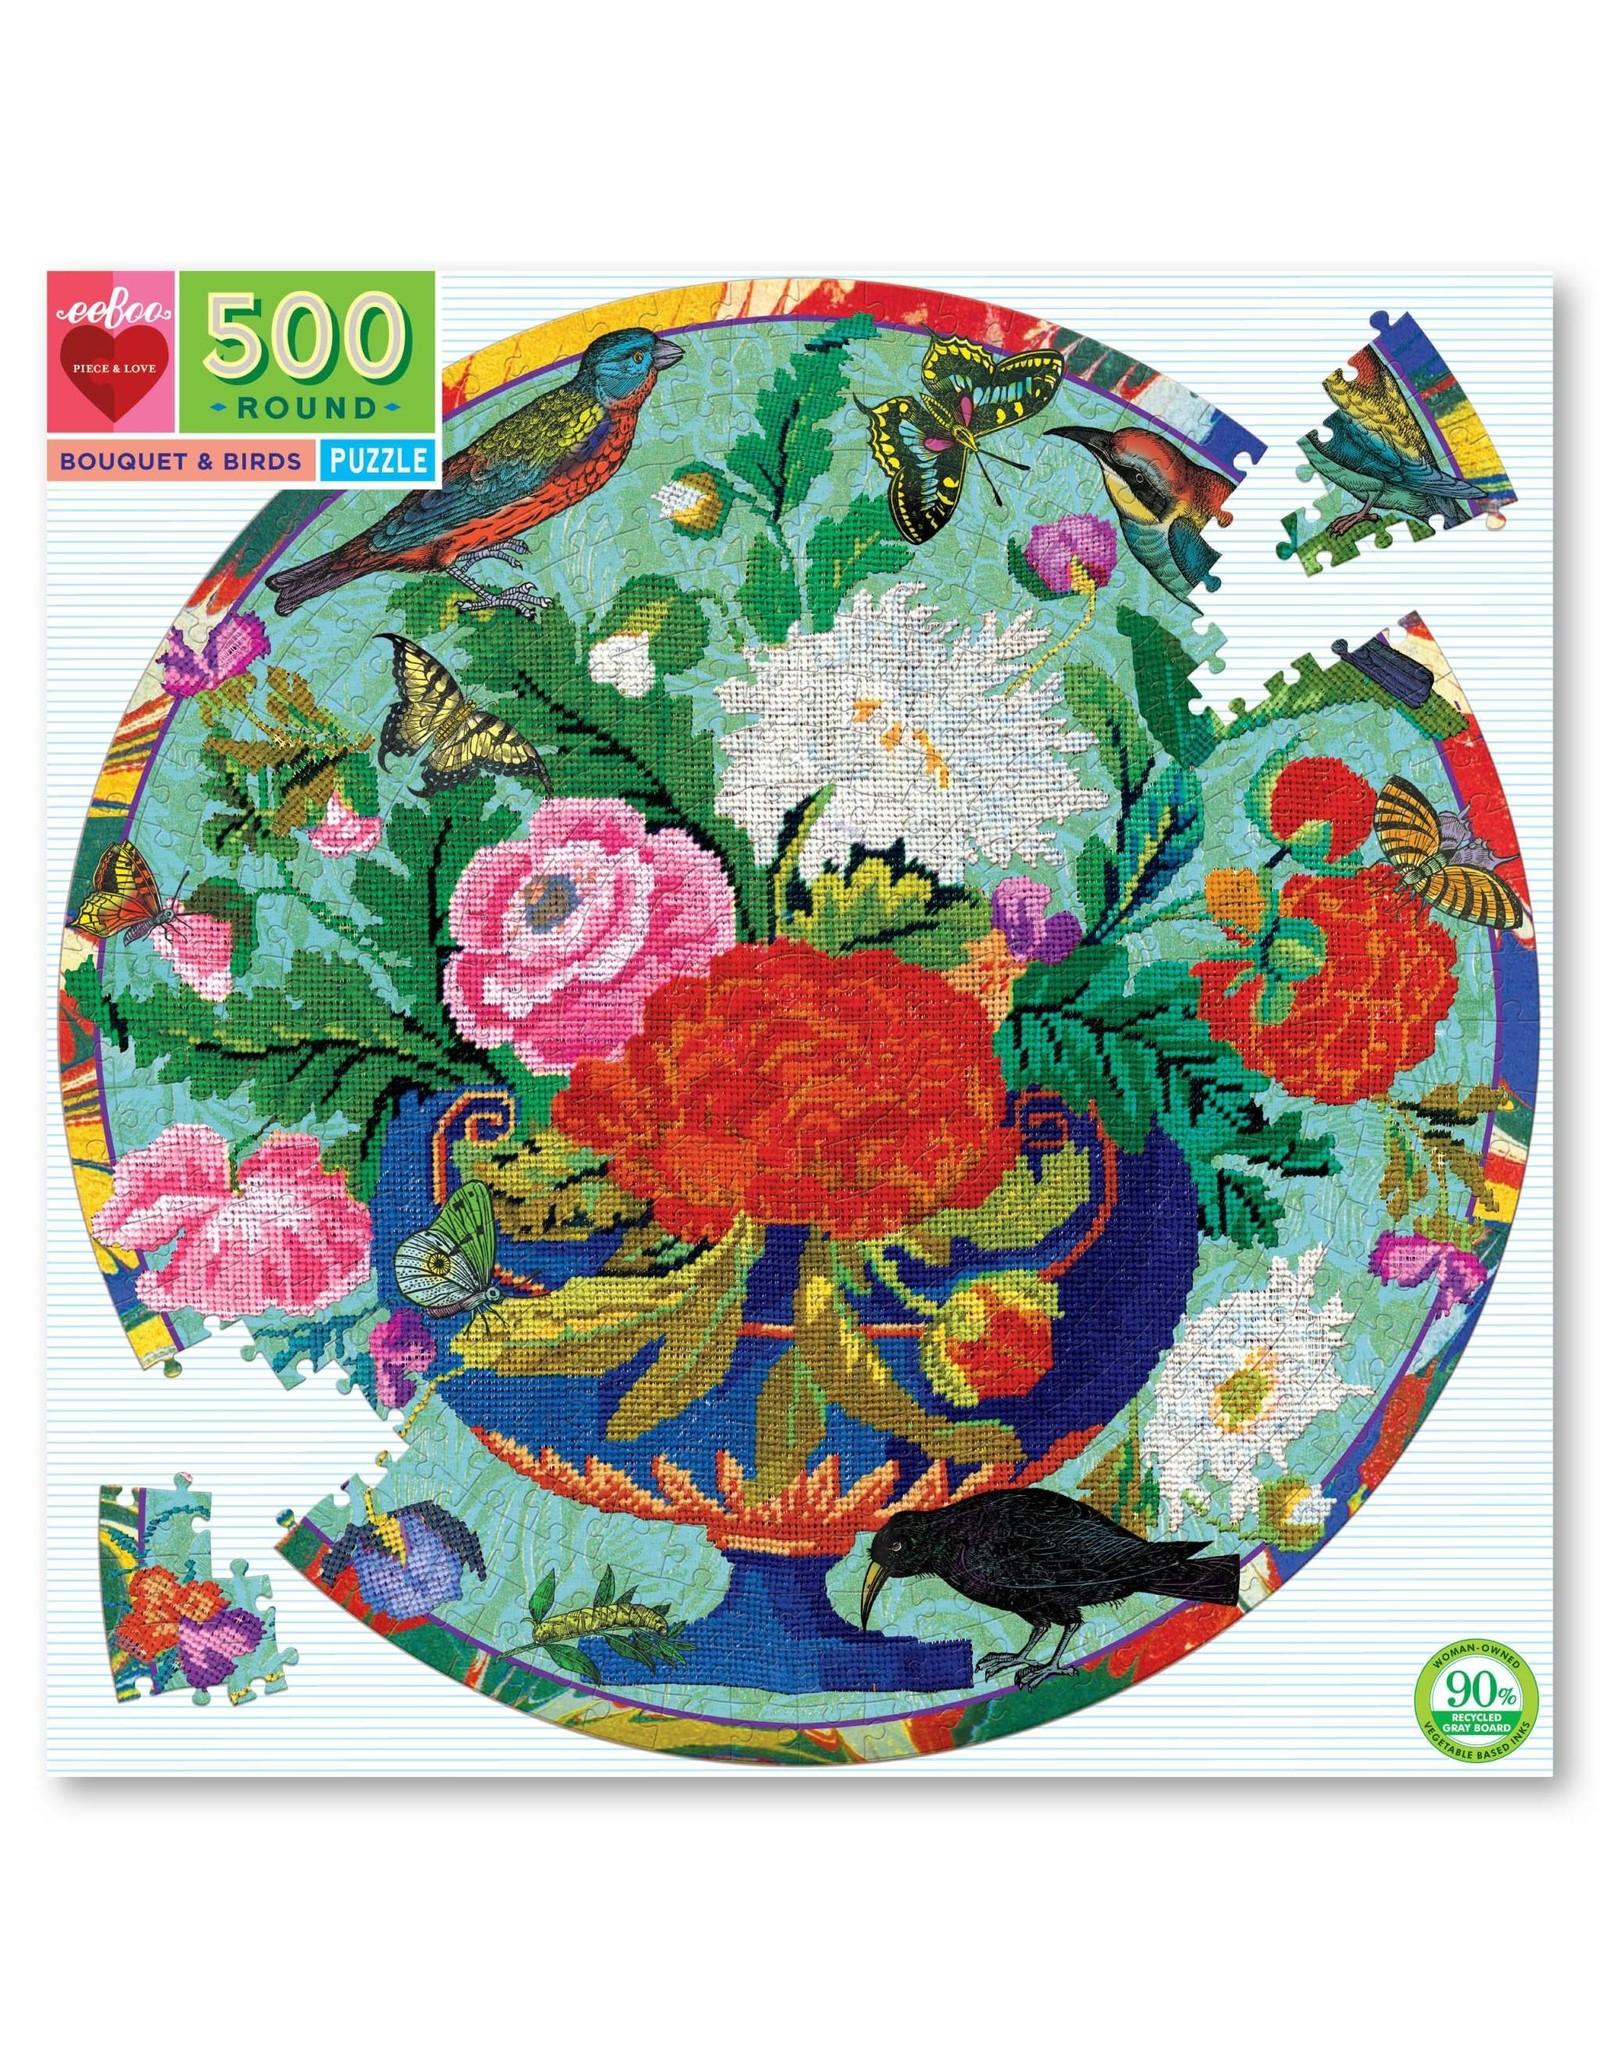 Eeboo 500 pcs. Bouquet and Birds Round Puzzle